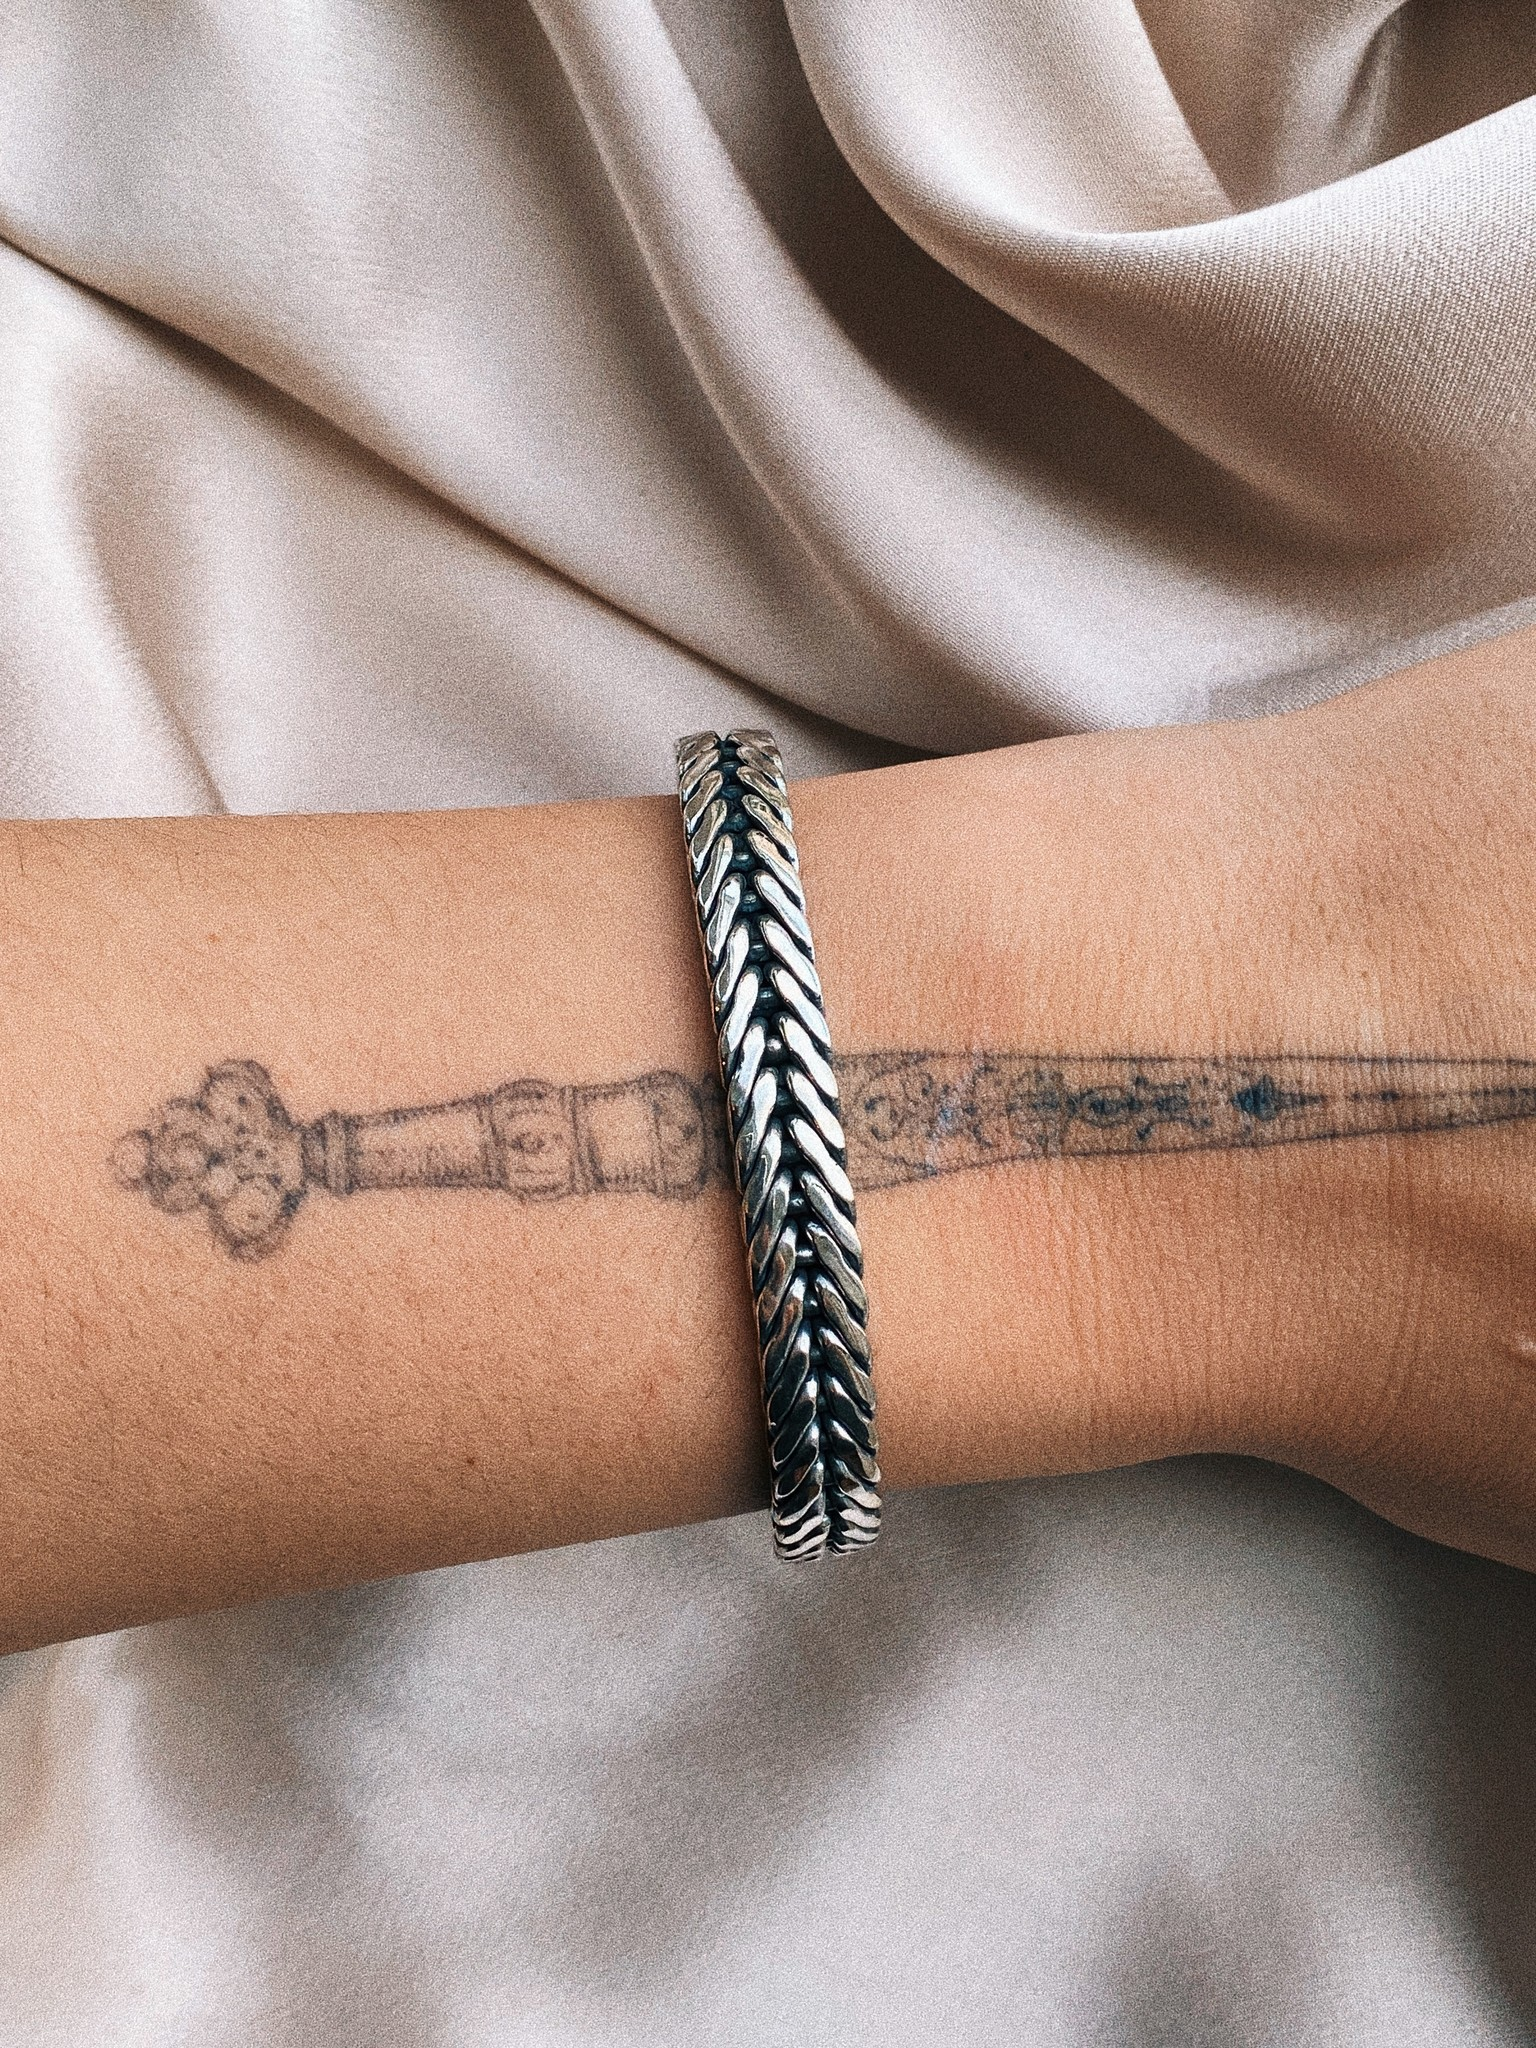 Bracelet 7-5